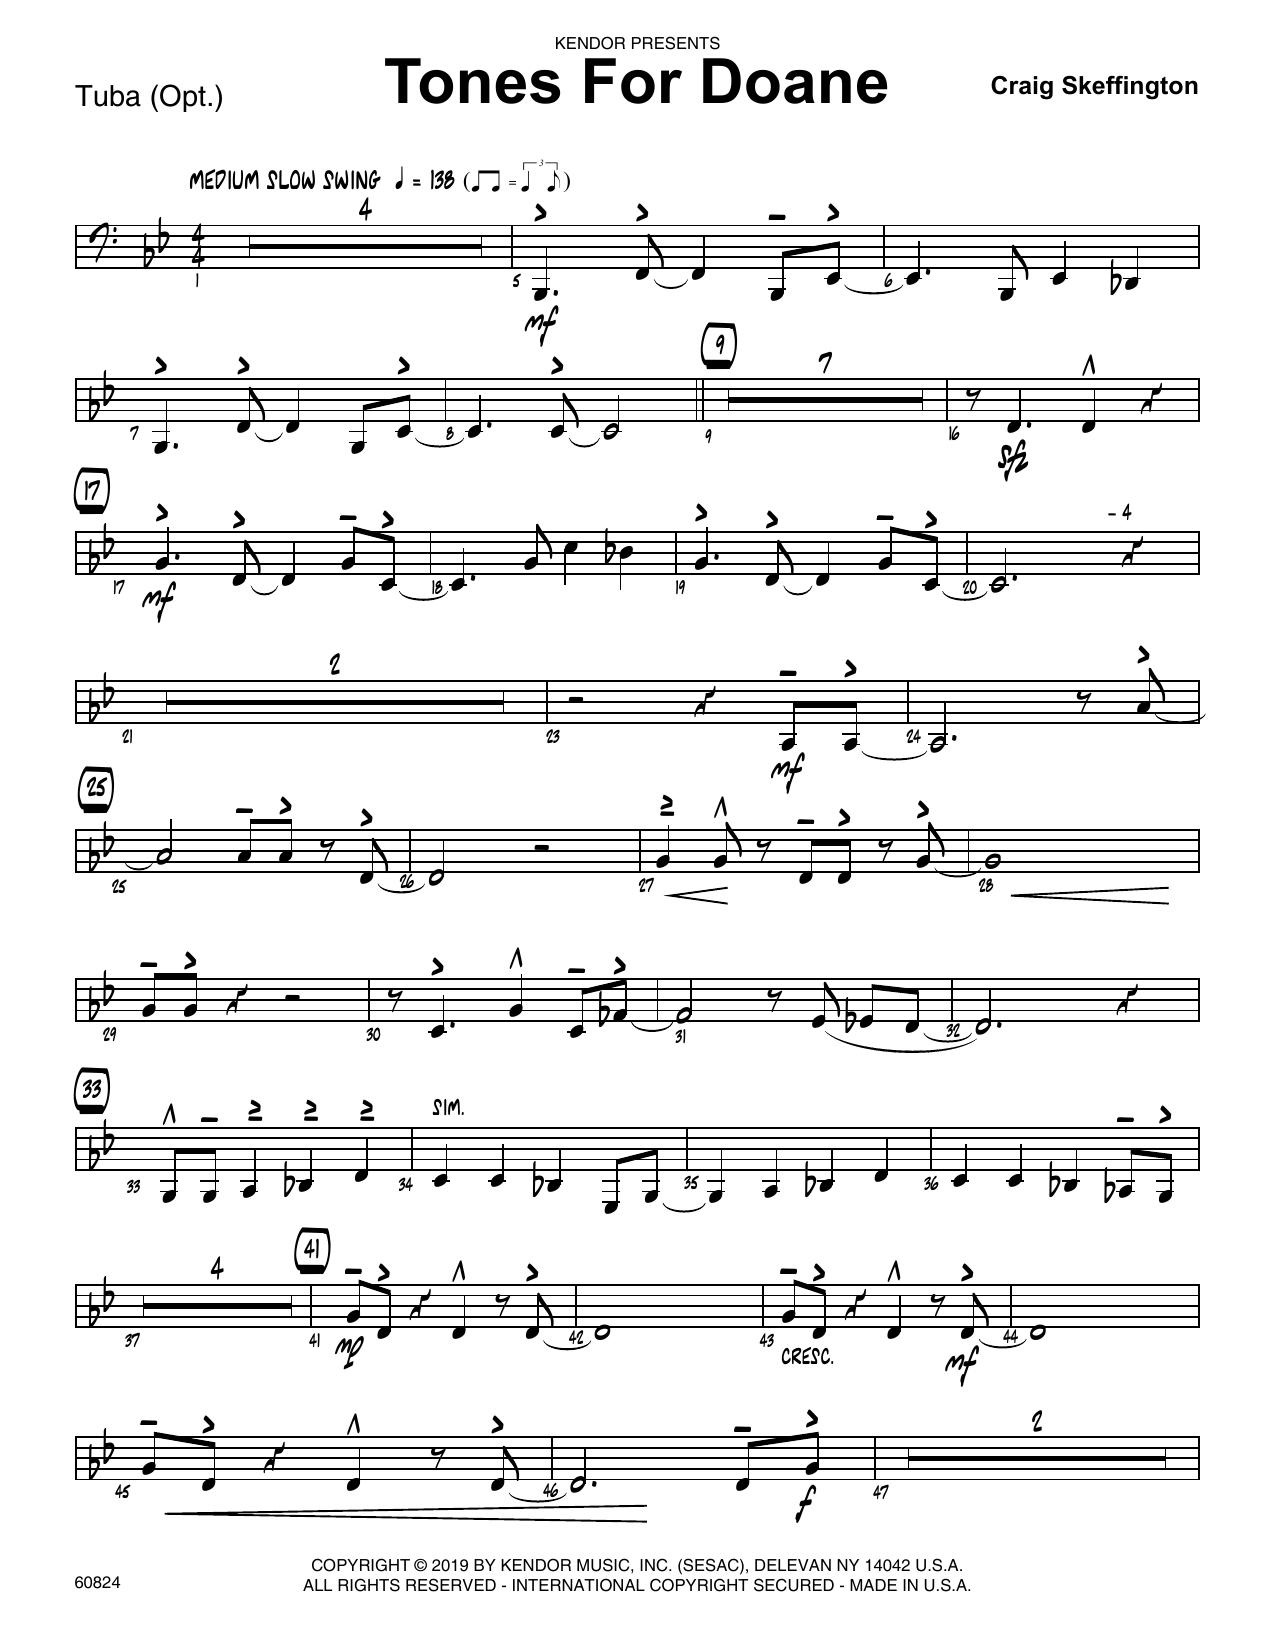 Craig Skeffington Tones For Doane - Tuba sheet music notes and chords. Download Printable PDF.